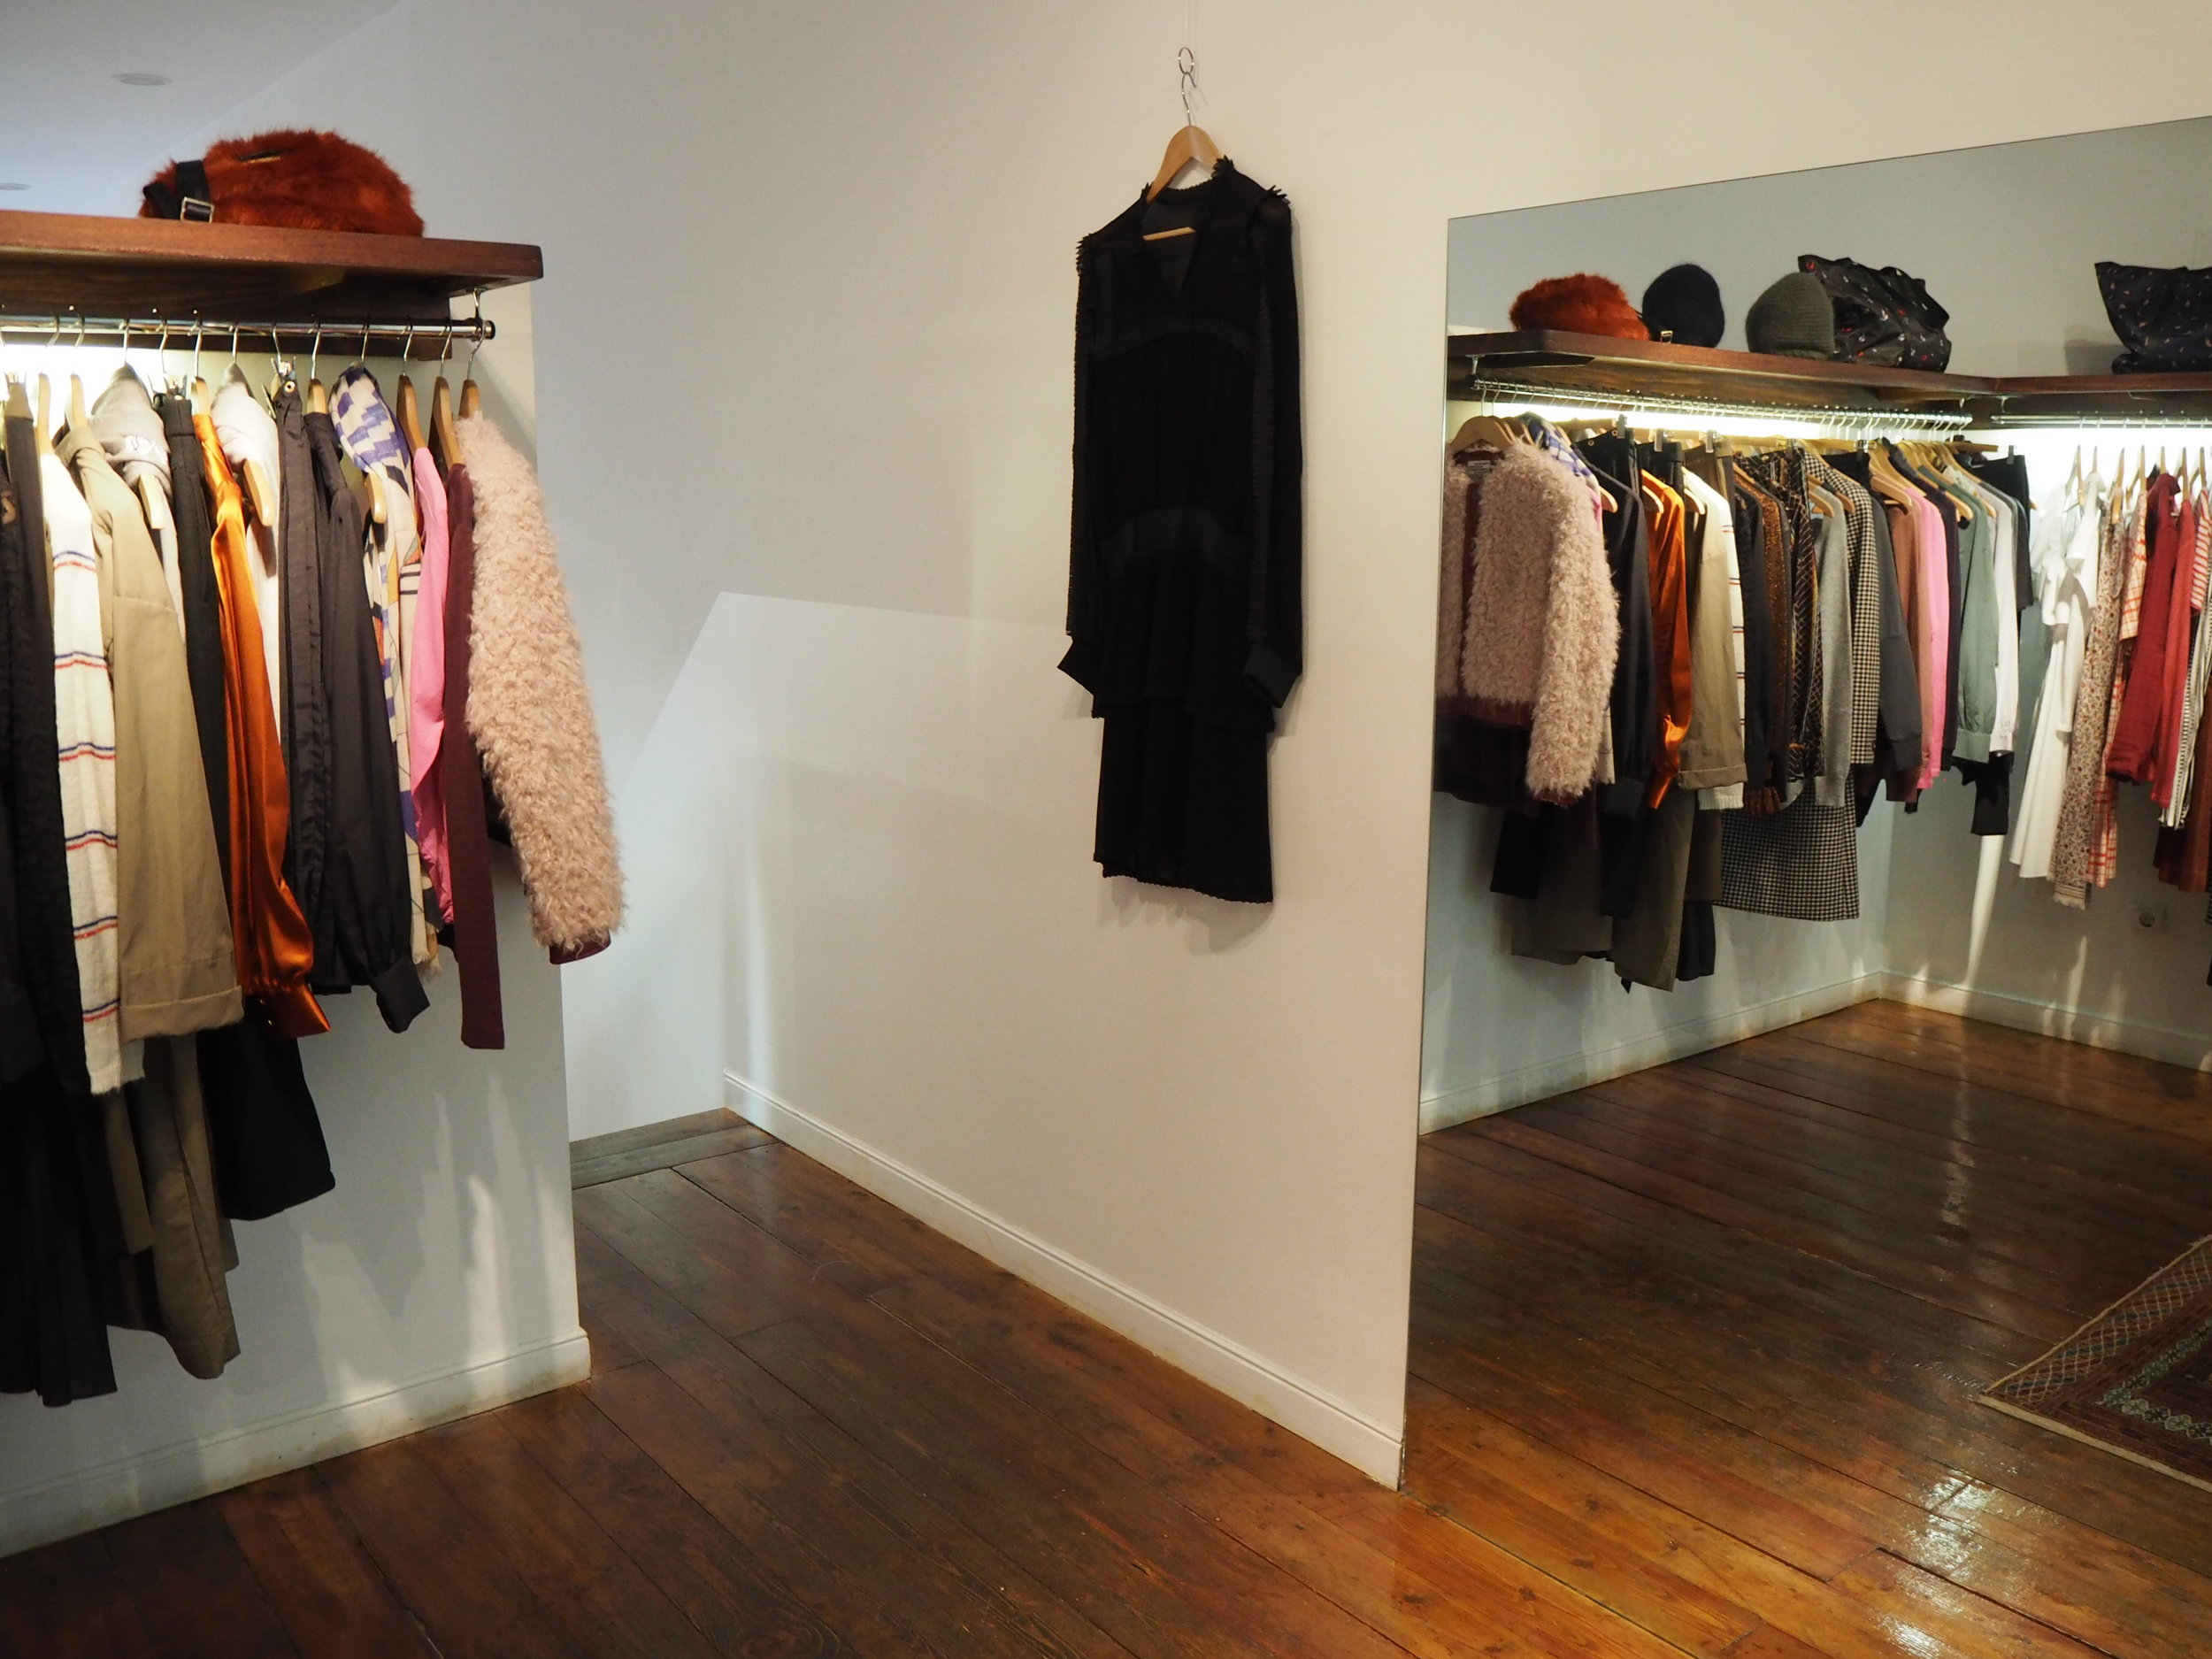 tiendas-ropa-madrid-originales-bunkha-ropa.JPG